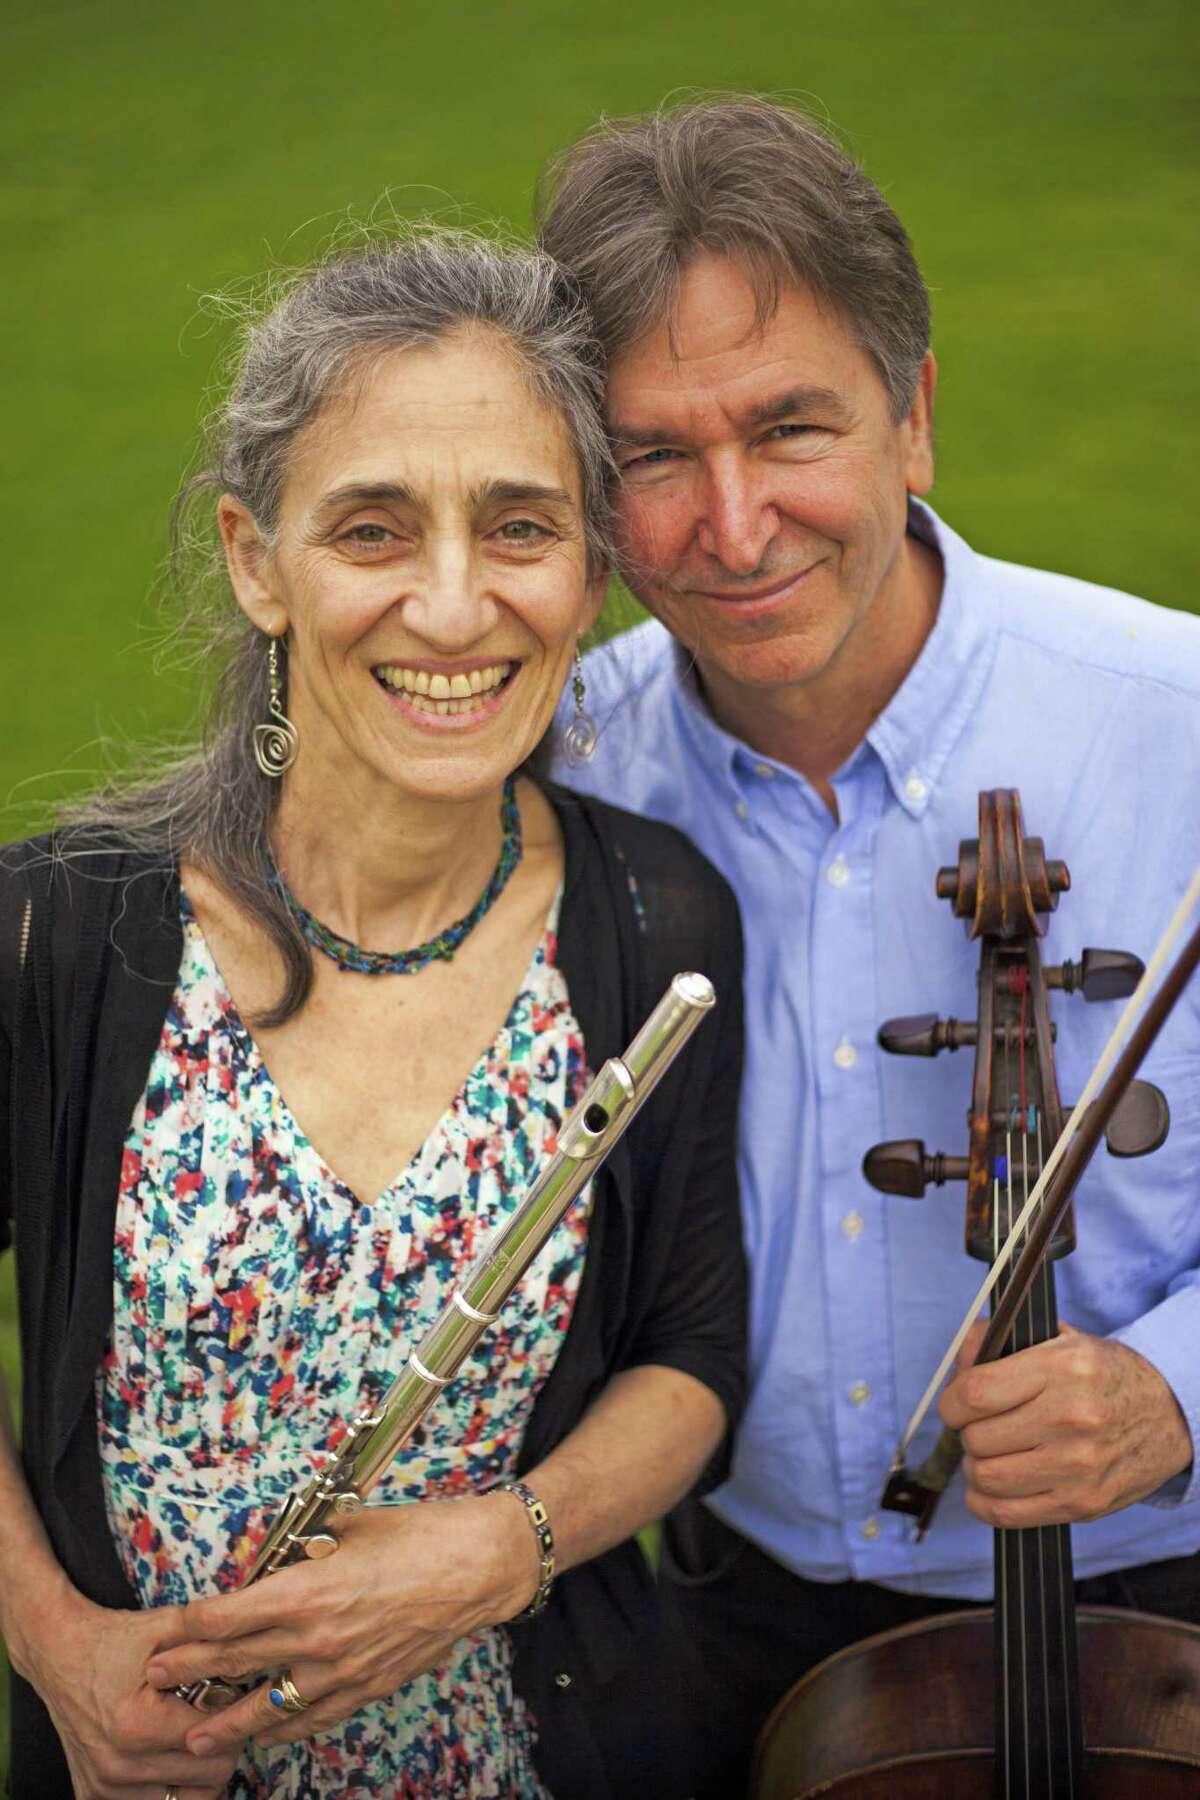 Susan Rotholz, flutist, and Eliot Bailen, cellist, founders of the Sherman Chamber Ensemble.